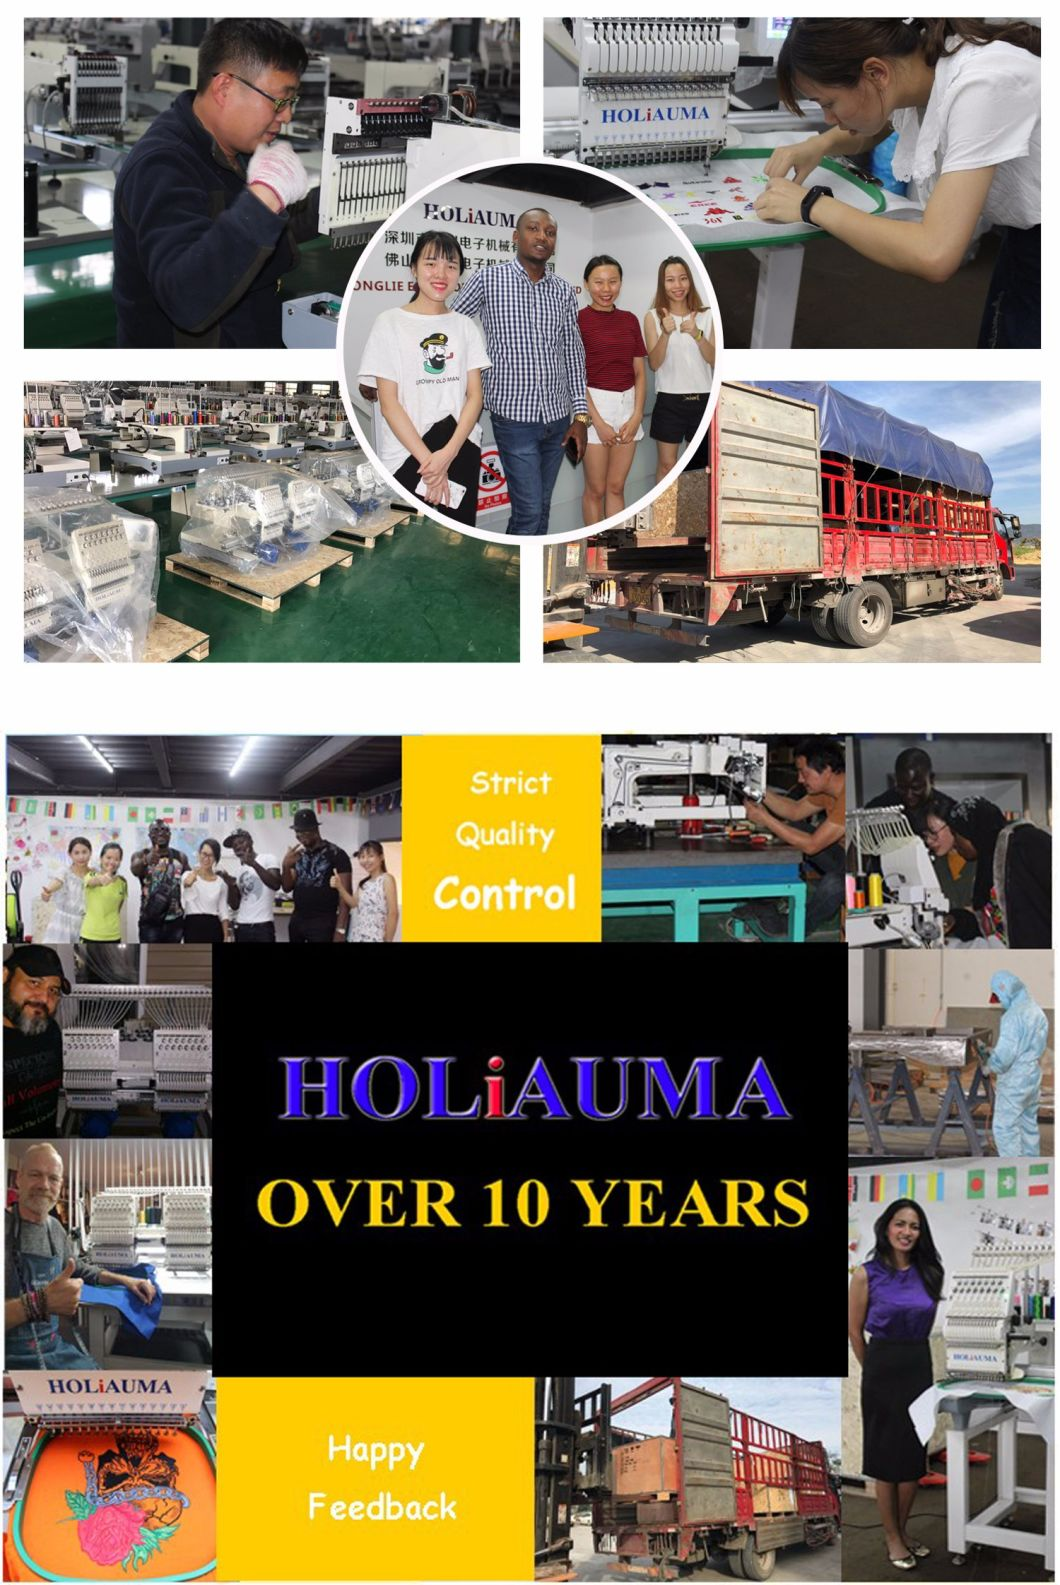 Holiauma 2 Head 15 Needles 1200 Spm Computerized Embroidery Machine with 100 Embroidery Machine Designs Like Tajima Embroidery Machine for Cap/Garment